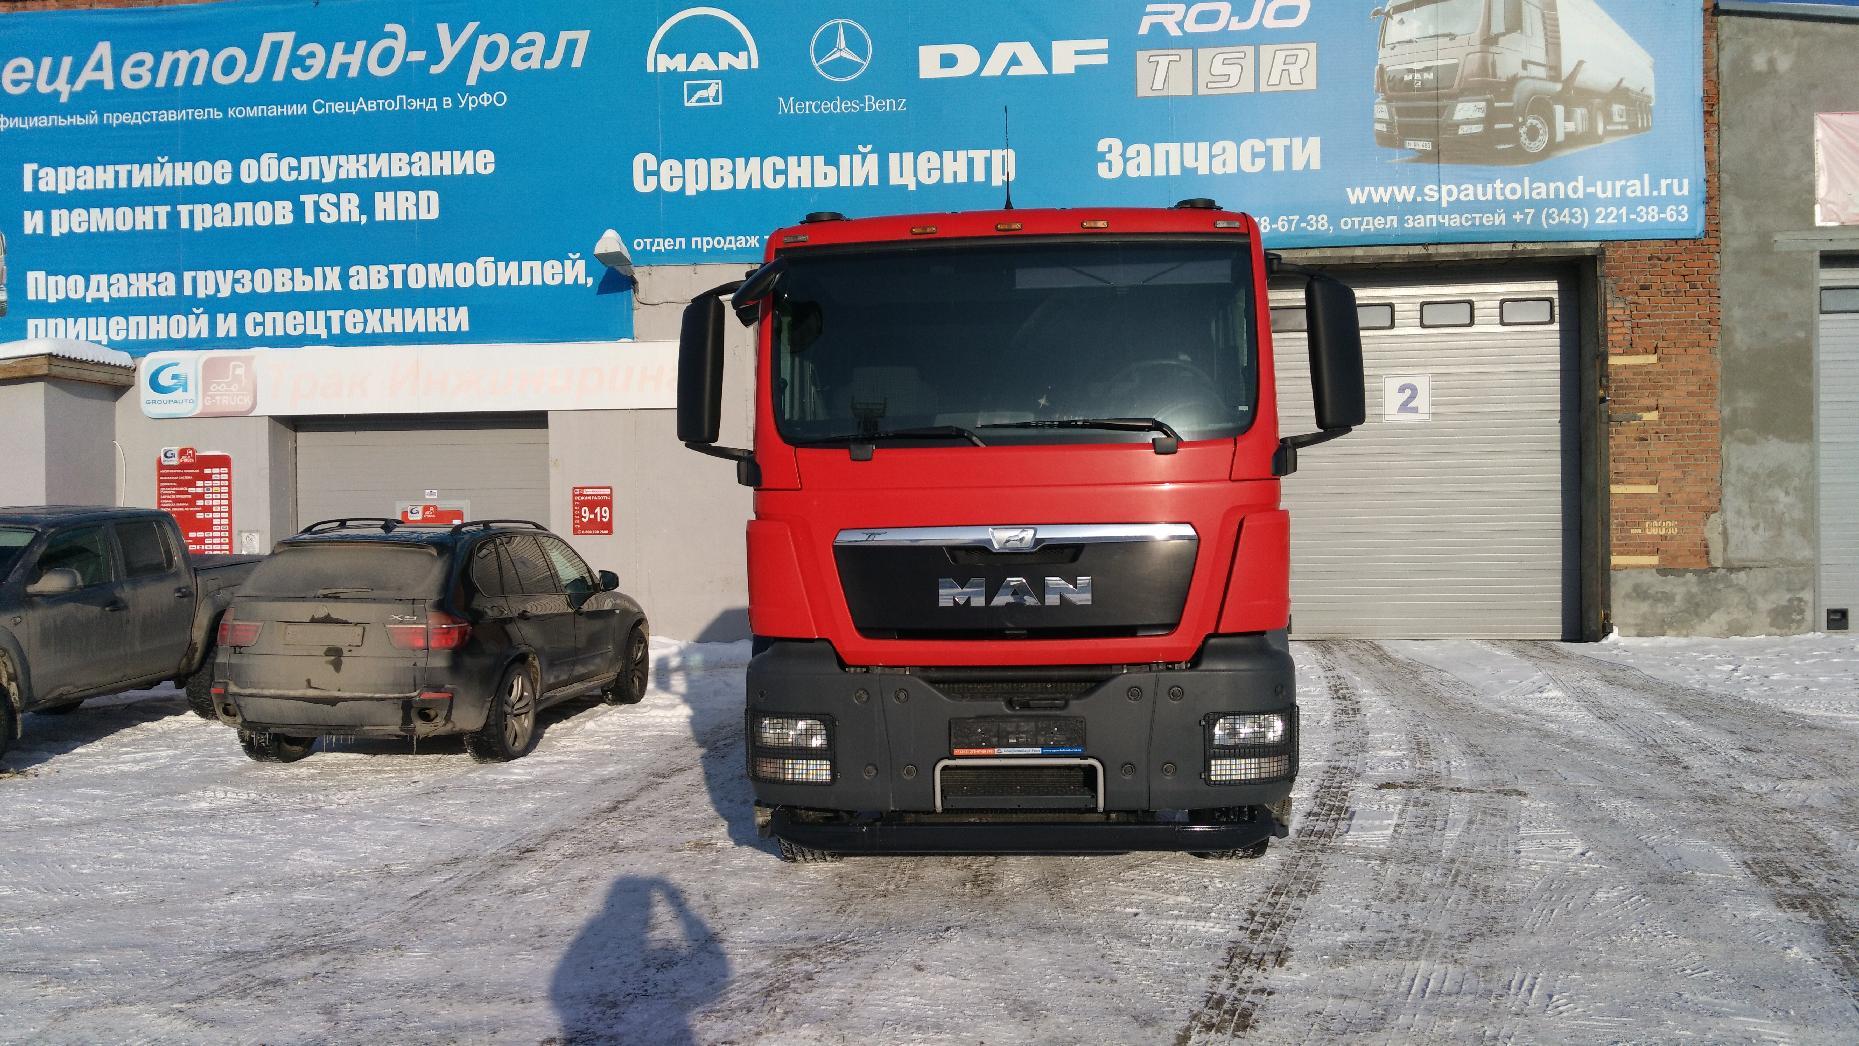 Продажа Тягач с пробегом МАН ТГС 33.